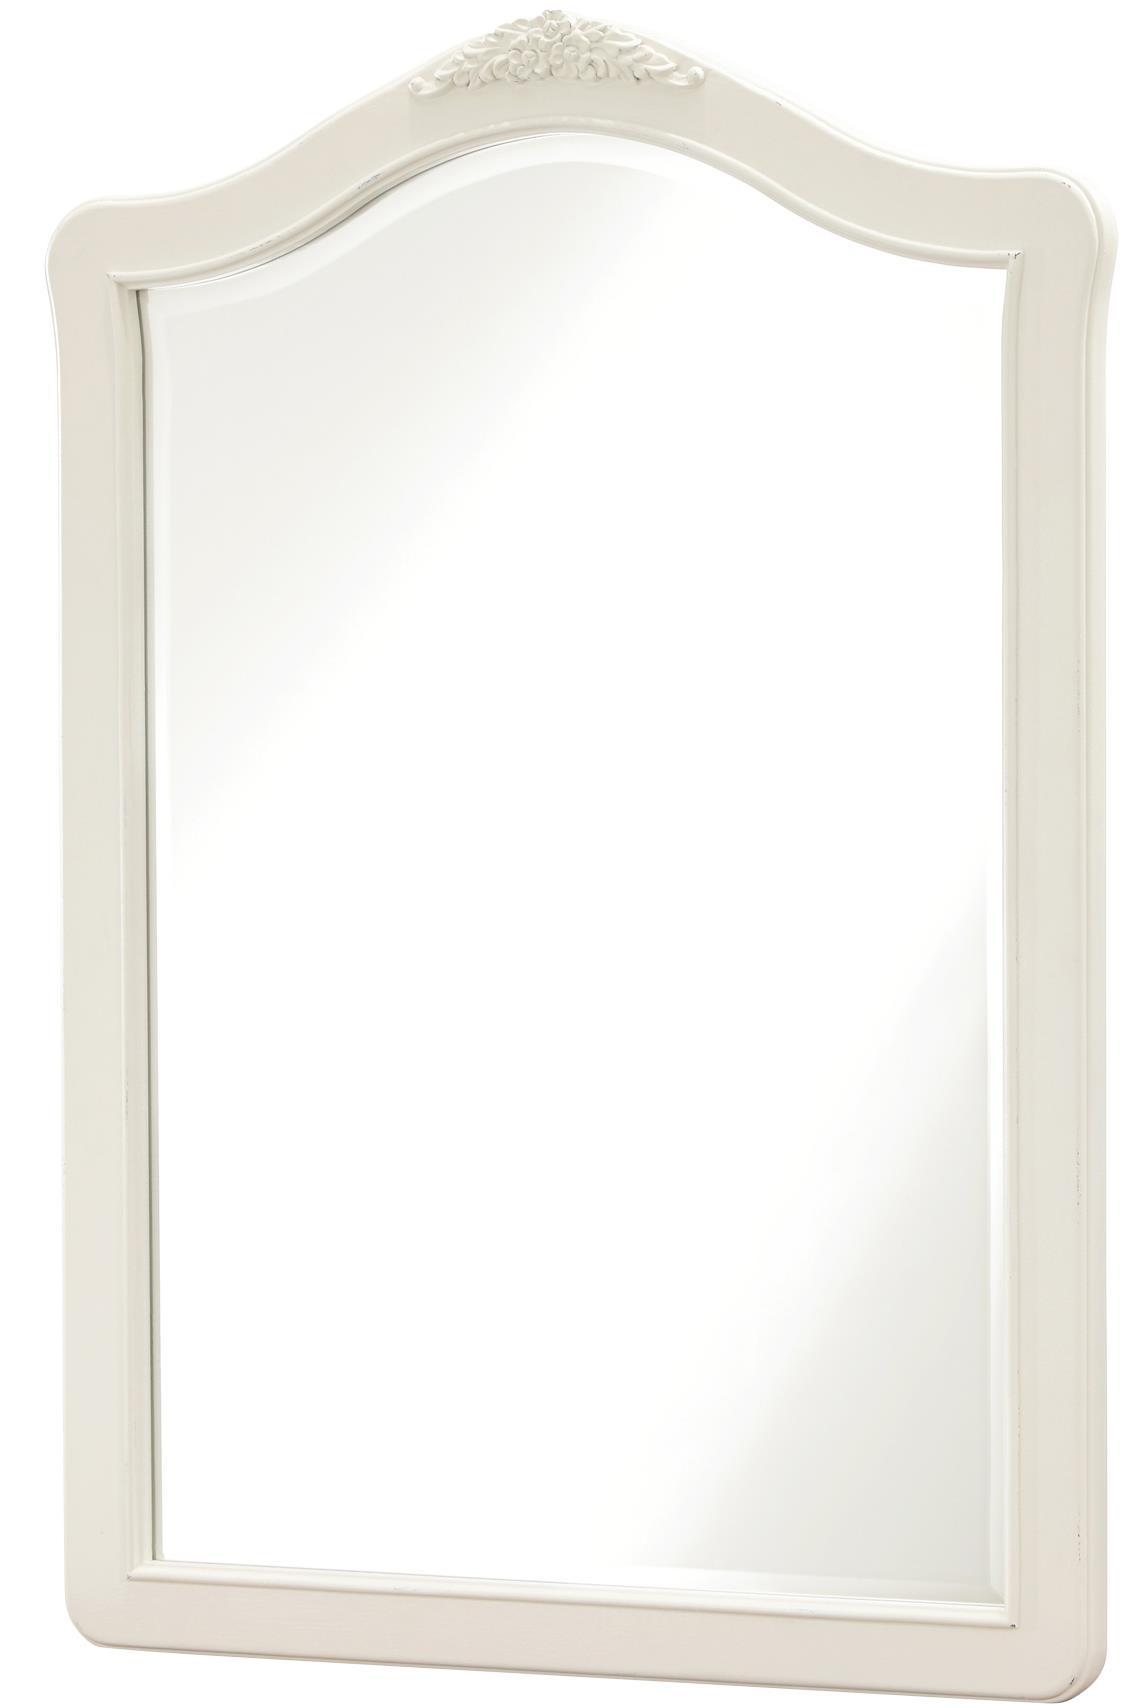 Morris Home Furnishings Penelope Penelope Mademoiselle Vertical Mirror - Item Number: 434A031